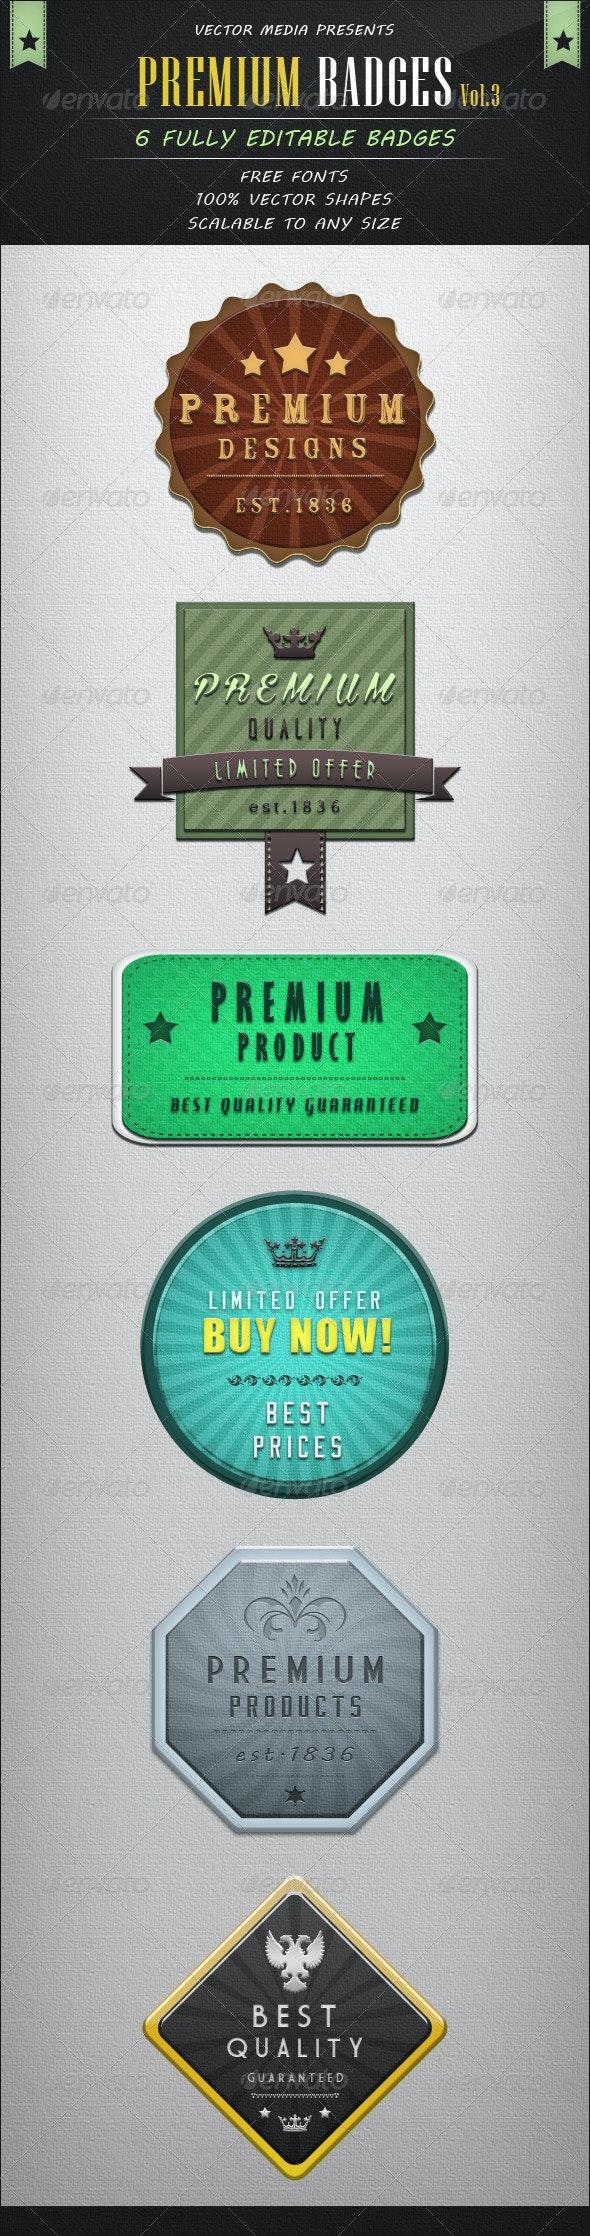 Premium Badges - Vol.3 - Badges & Stickers Web Elements